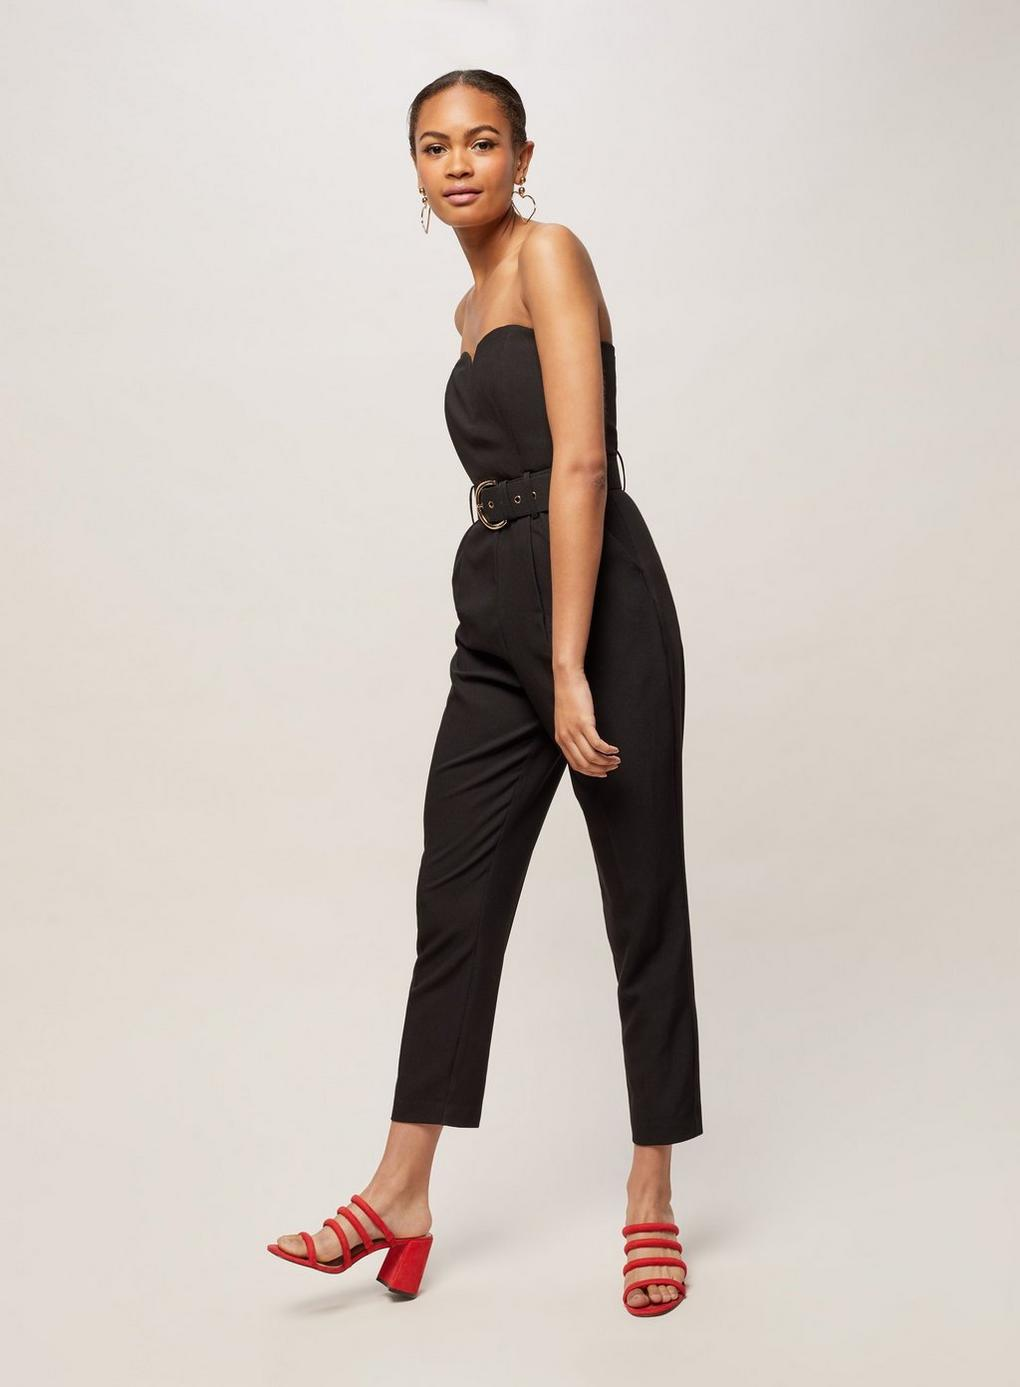 221bd240e256 Lyst - Miss Selfridge Bandeau Belted Jumpsuit in Black - Save 32.5%